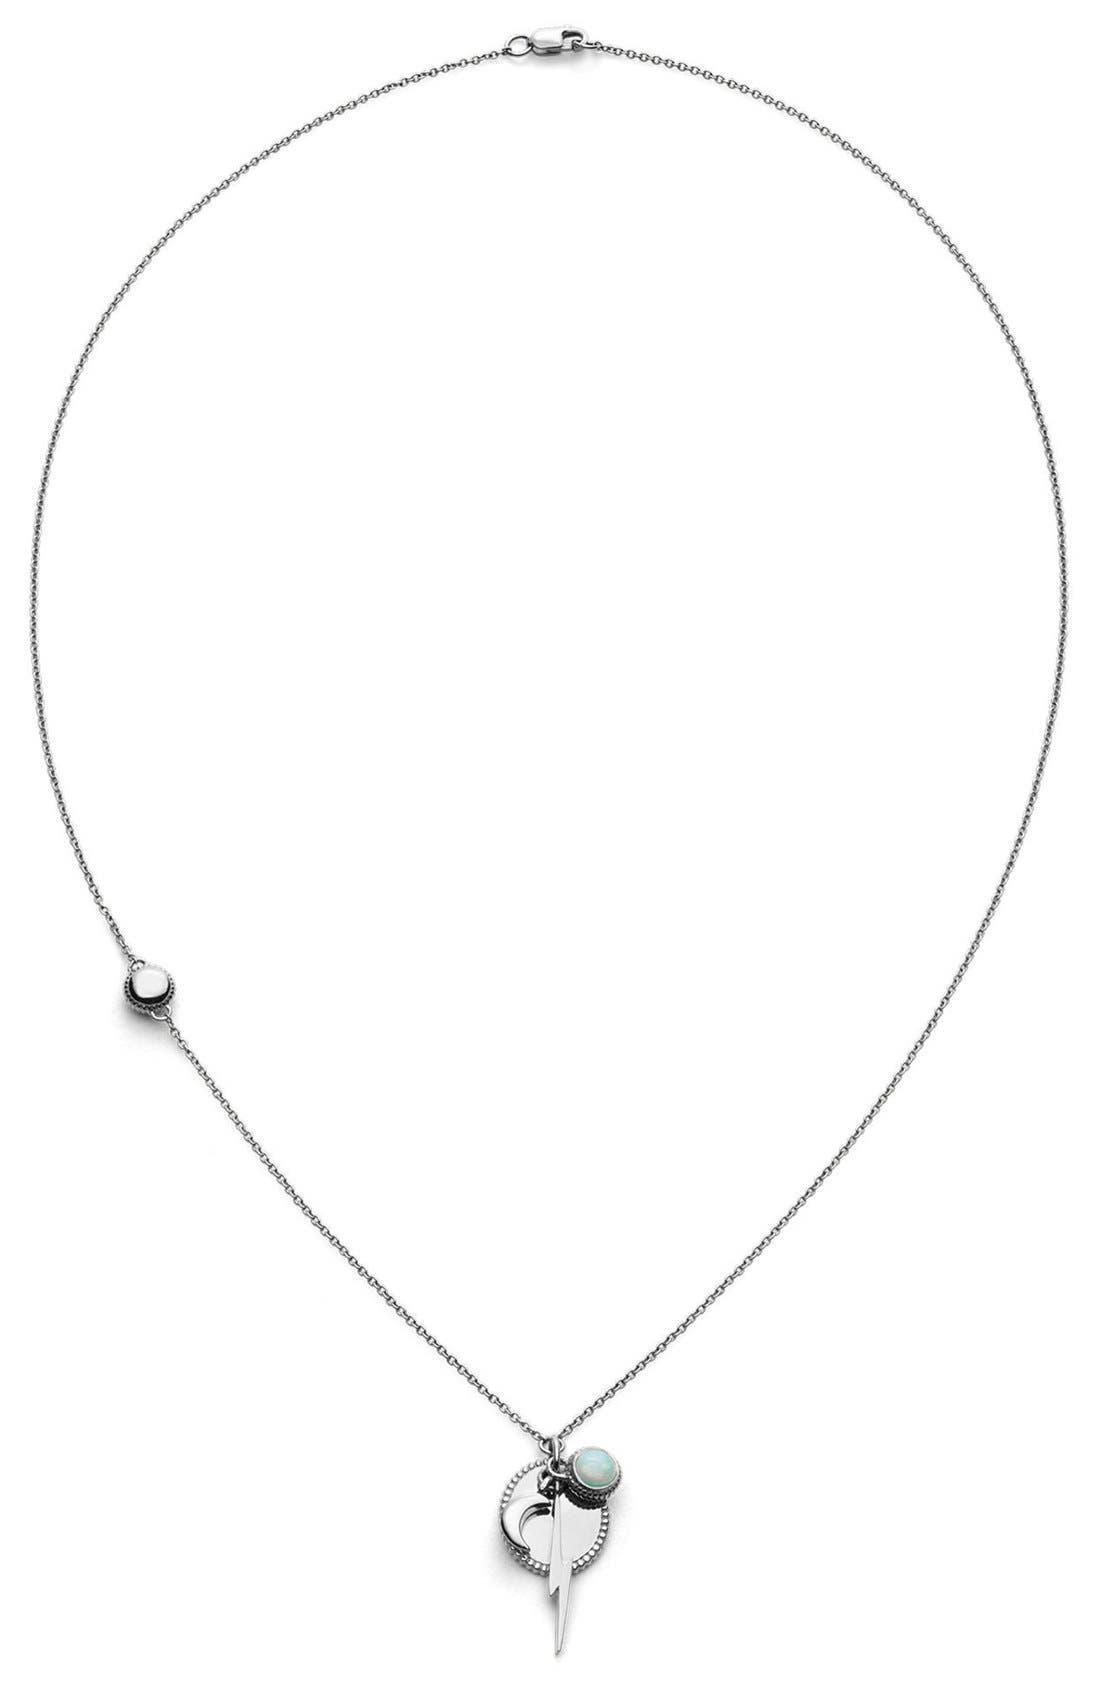 Bolt Cluster Pendant Necklace,                             Alternate thumbnail 2, color,                             Sterling Silver